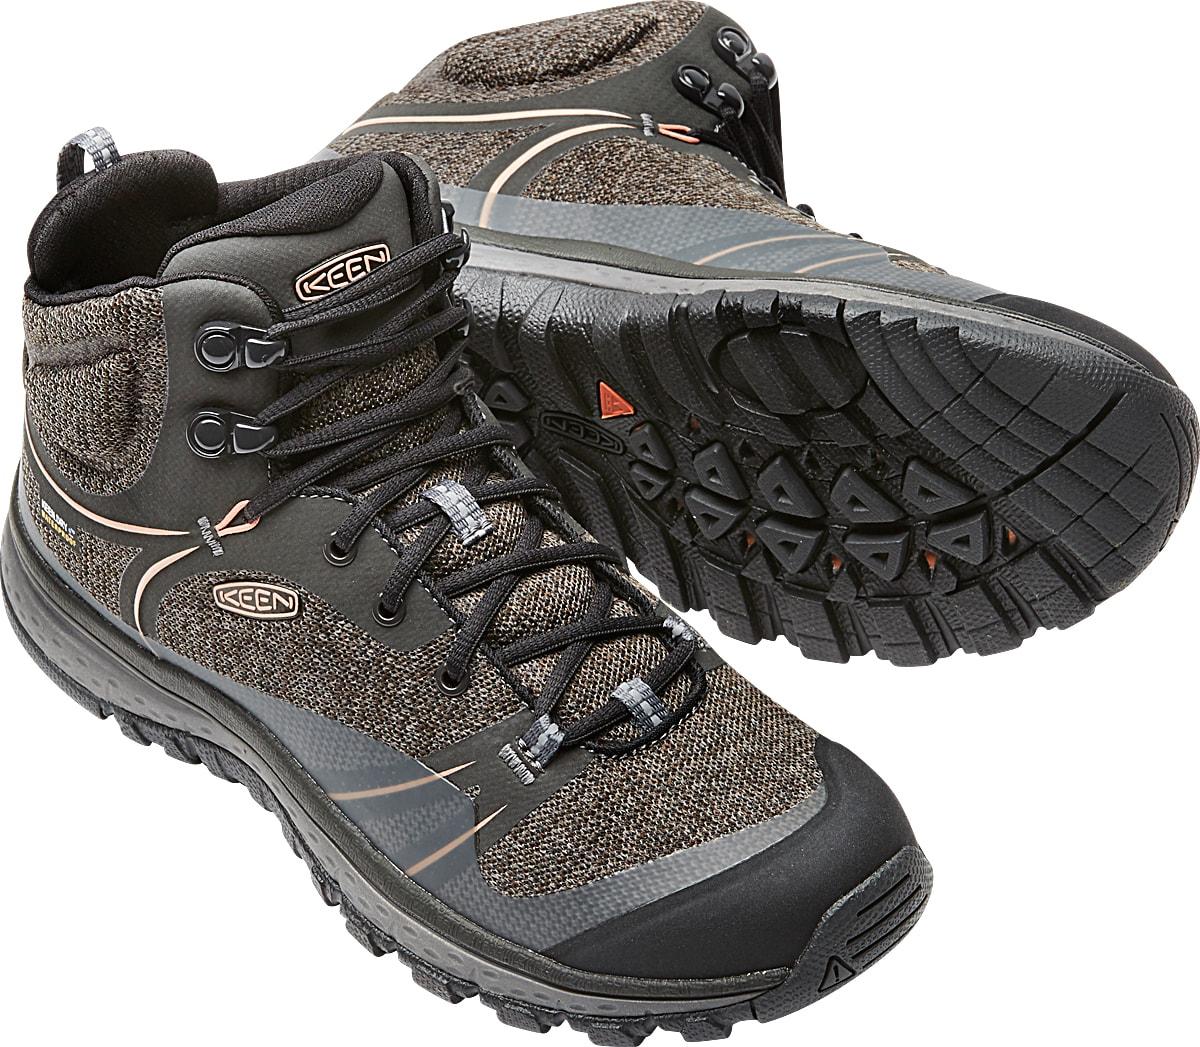 Keen Terradora Mid Wp Hiking Boots Womens 2018